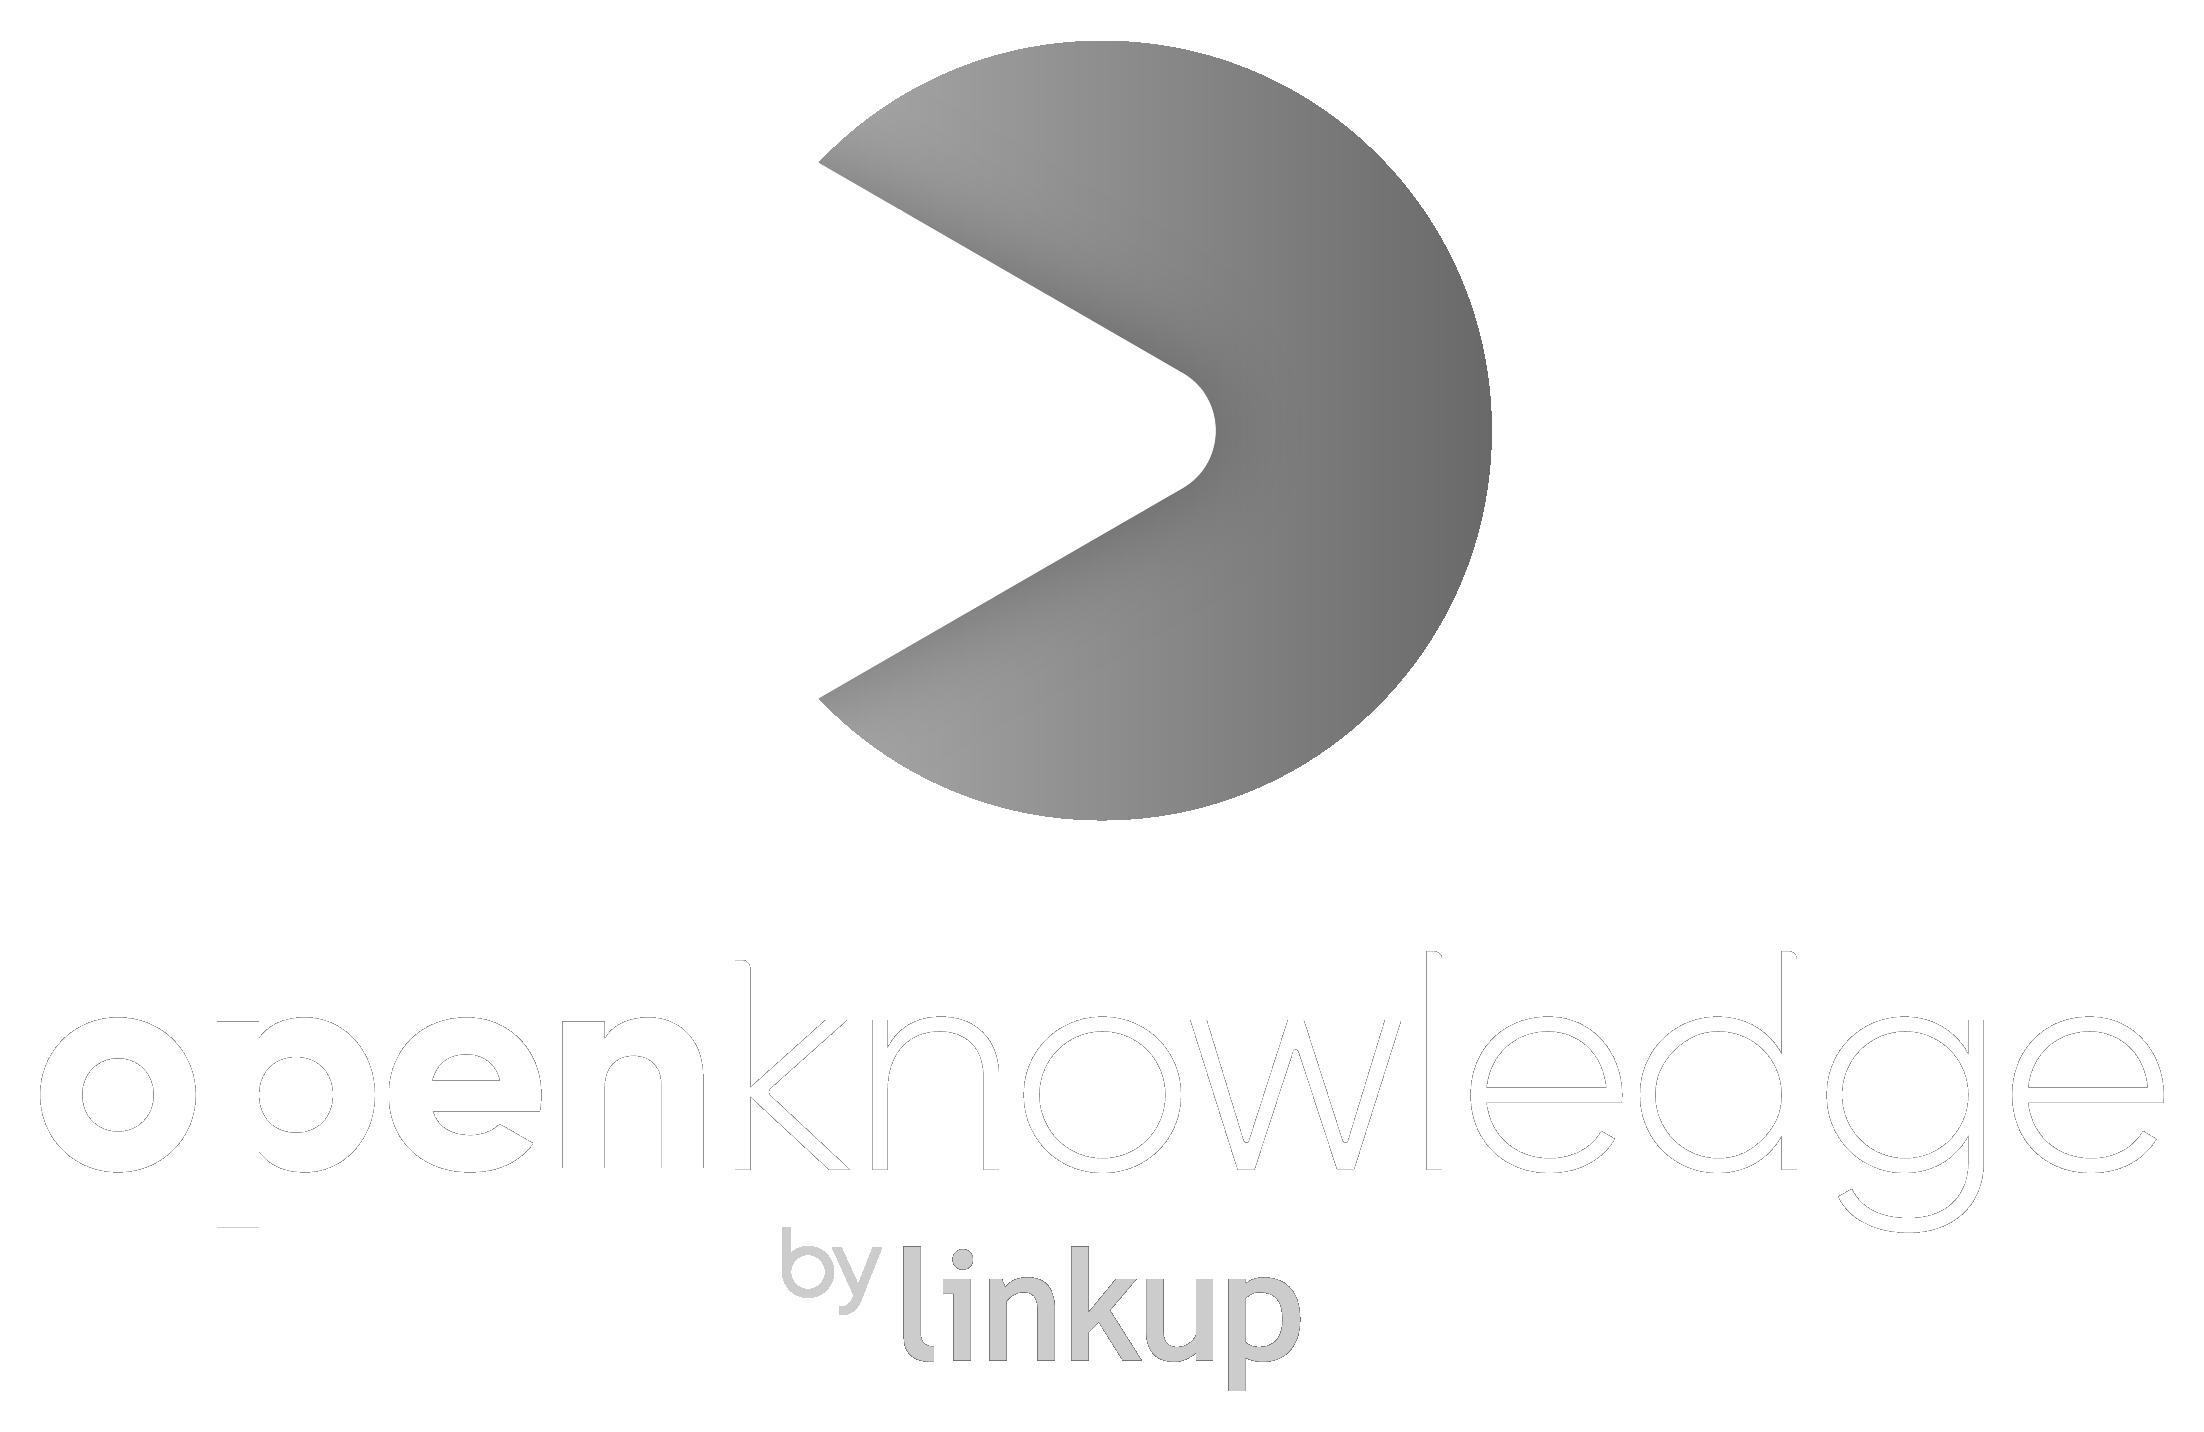 Logo Eureka coaching scolaire